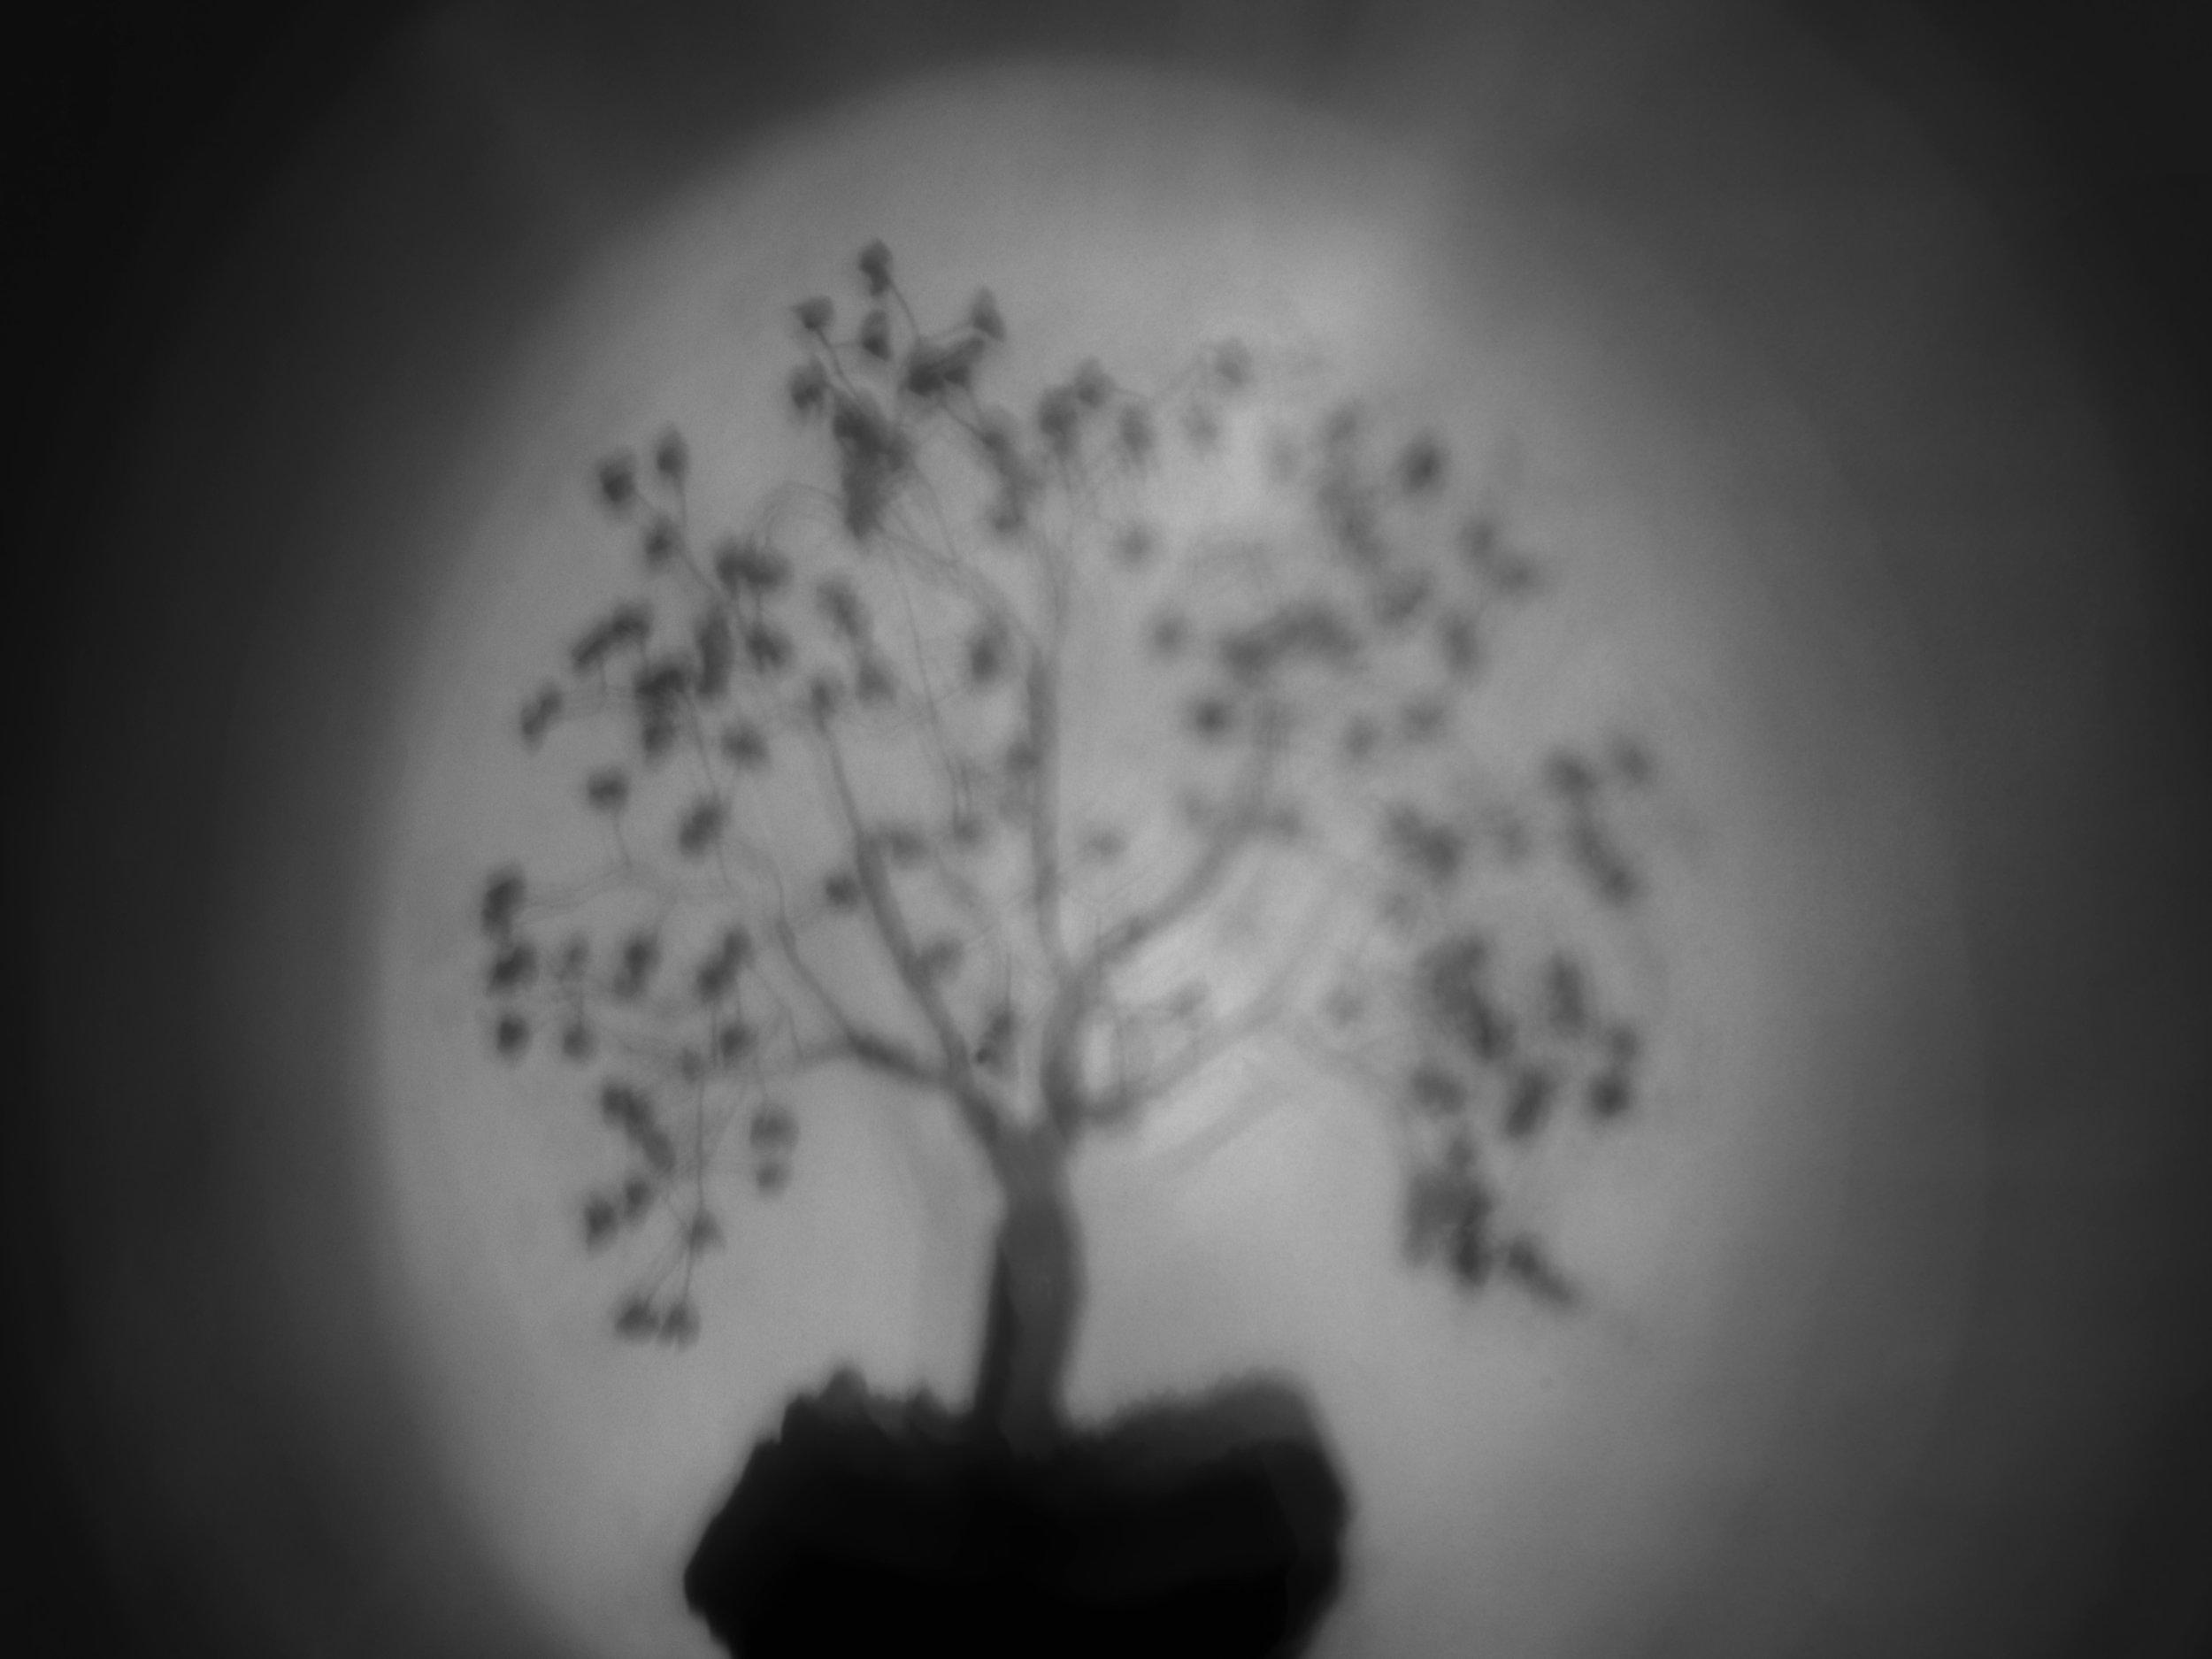 Lightand Shadow in the Future-QEP FINE ART 2018-Life-Marco Garofalo-Fine Art Photography-2018.jpg